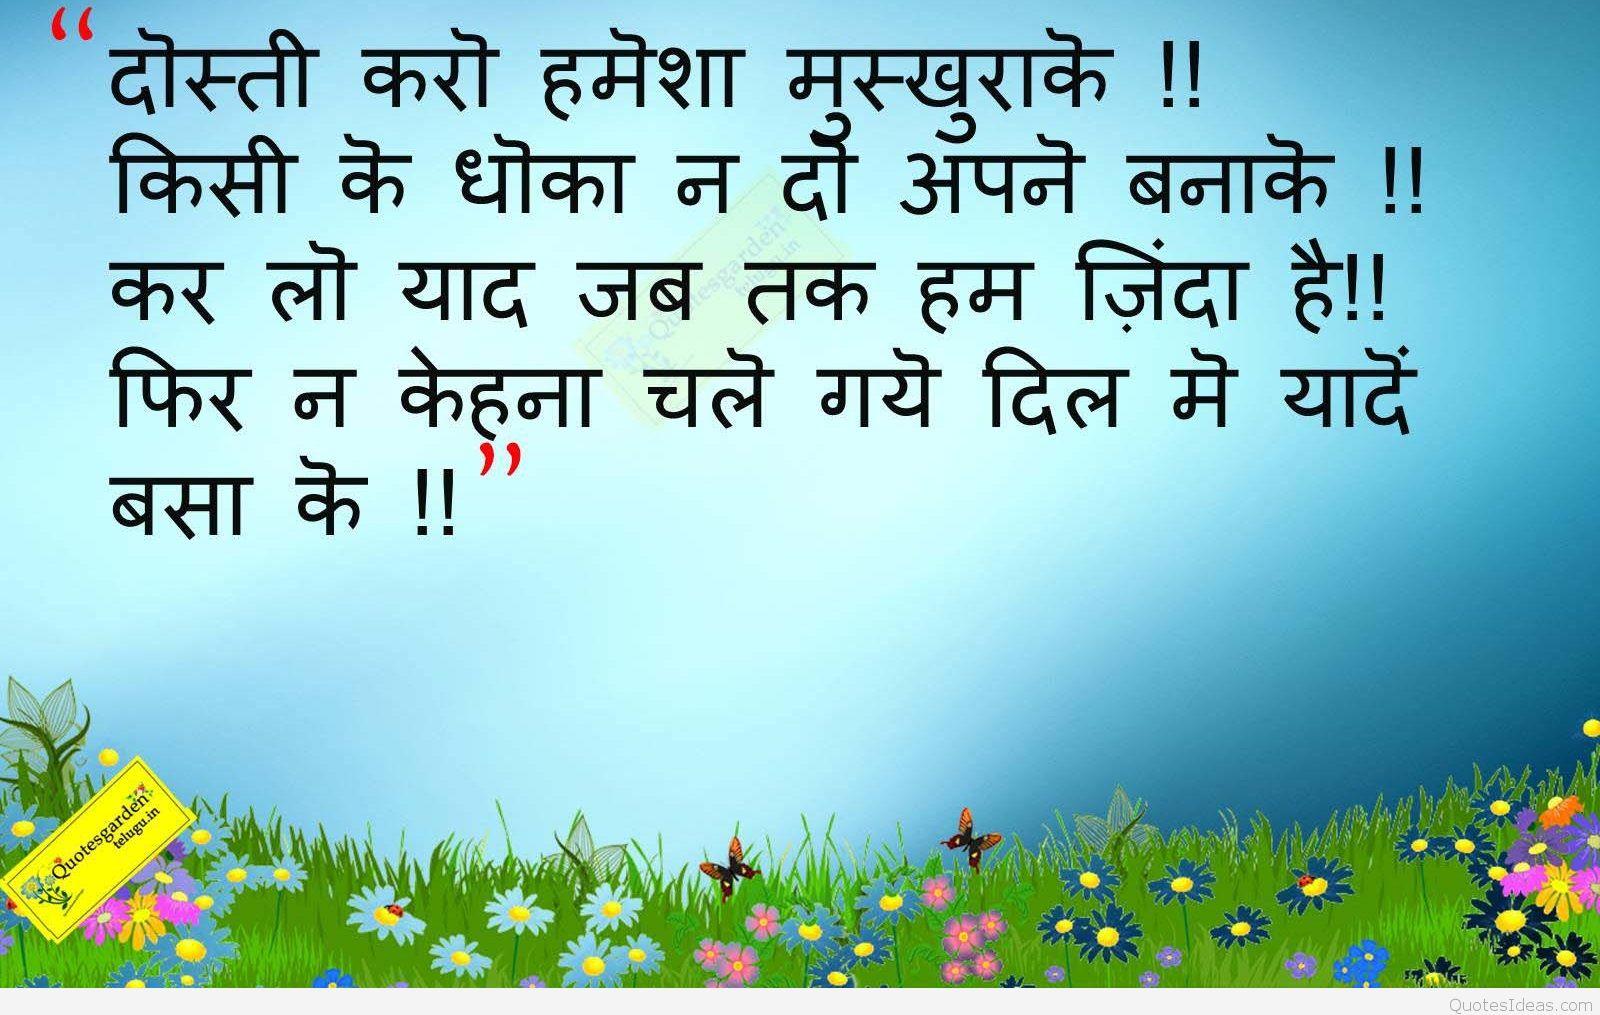 Best Hindi Shayari Rishikesh 1526466 Hd Wallpaper